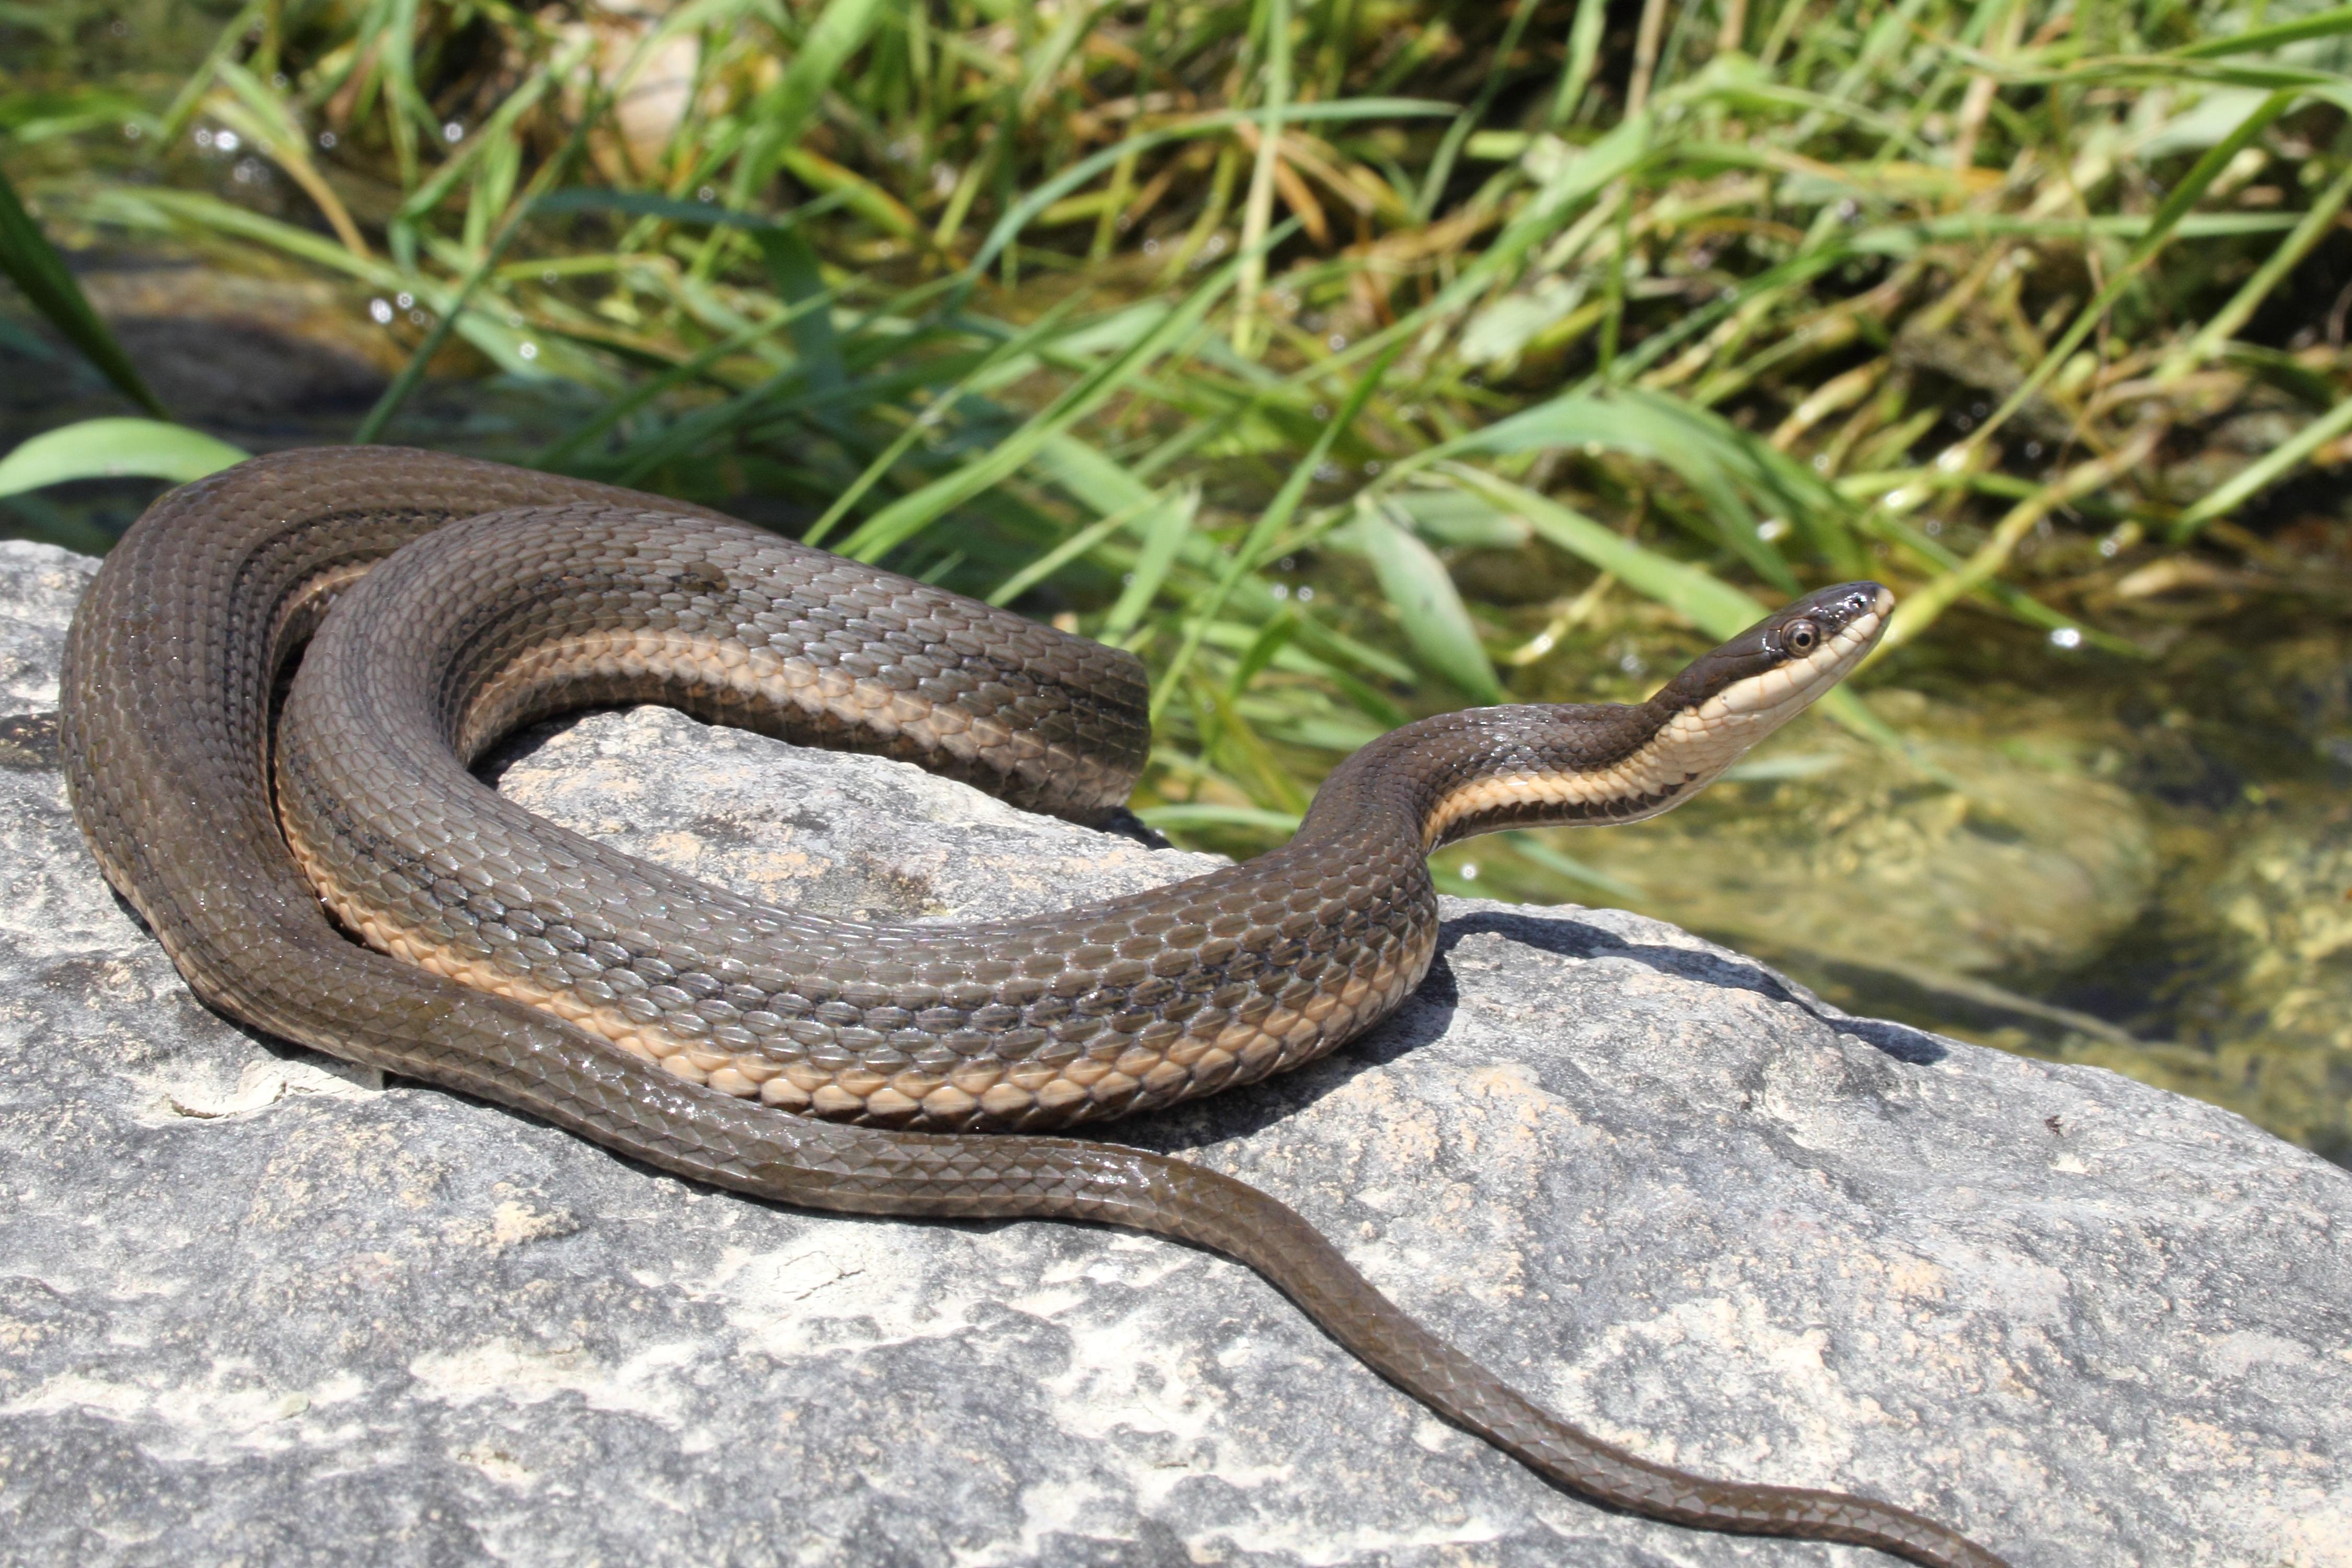 queen snake